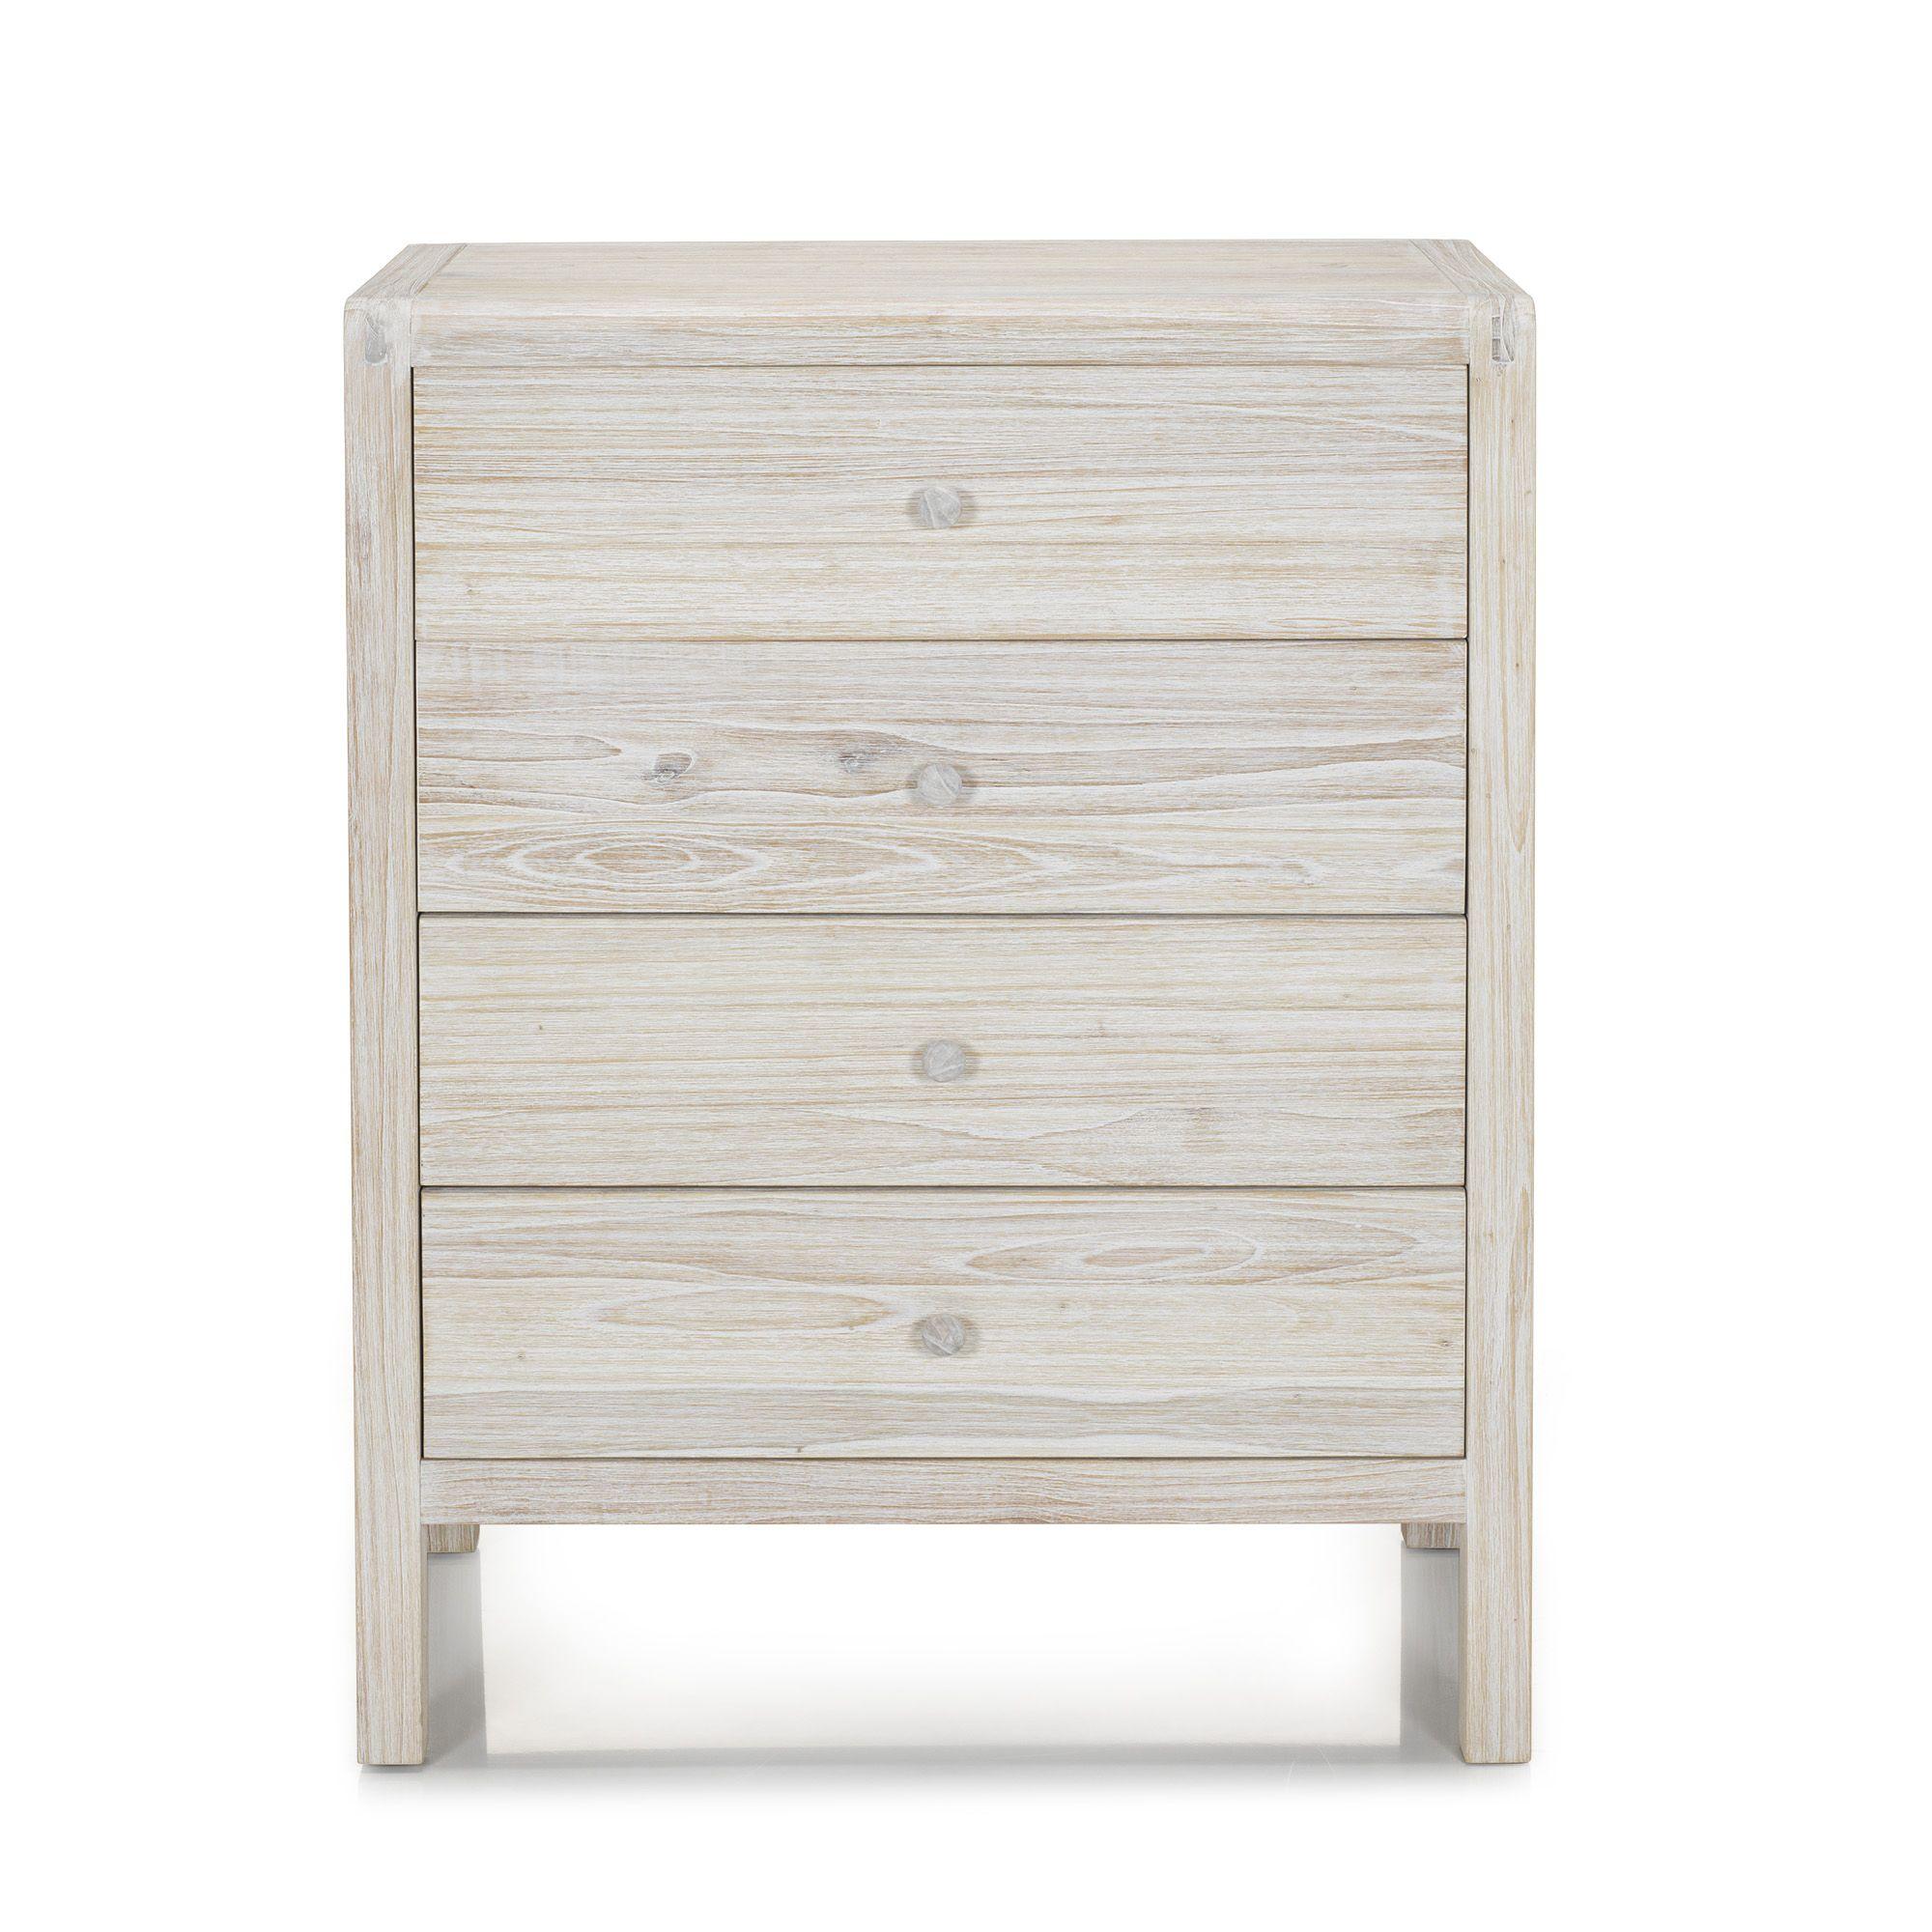 alin a toledo commode 4 tiroirs pas cher achat vente. Black Bedroom Furniture Sets. Home Design Ideas